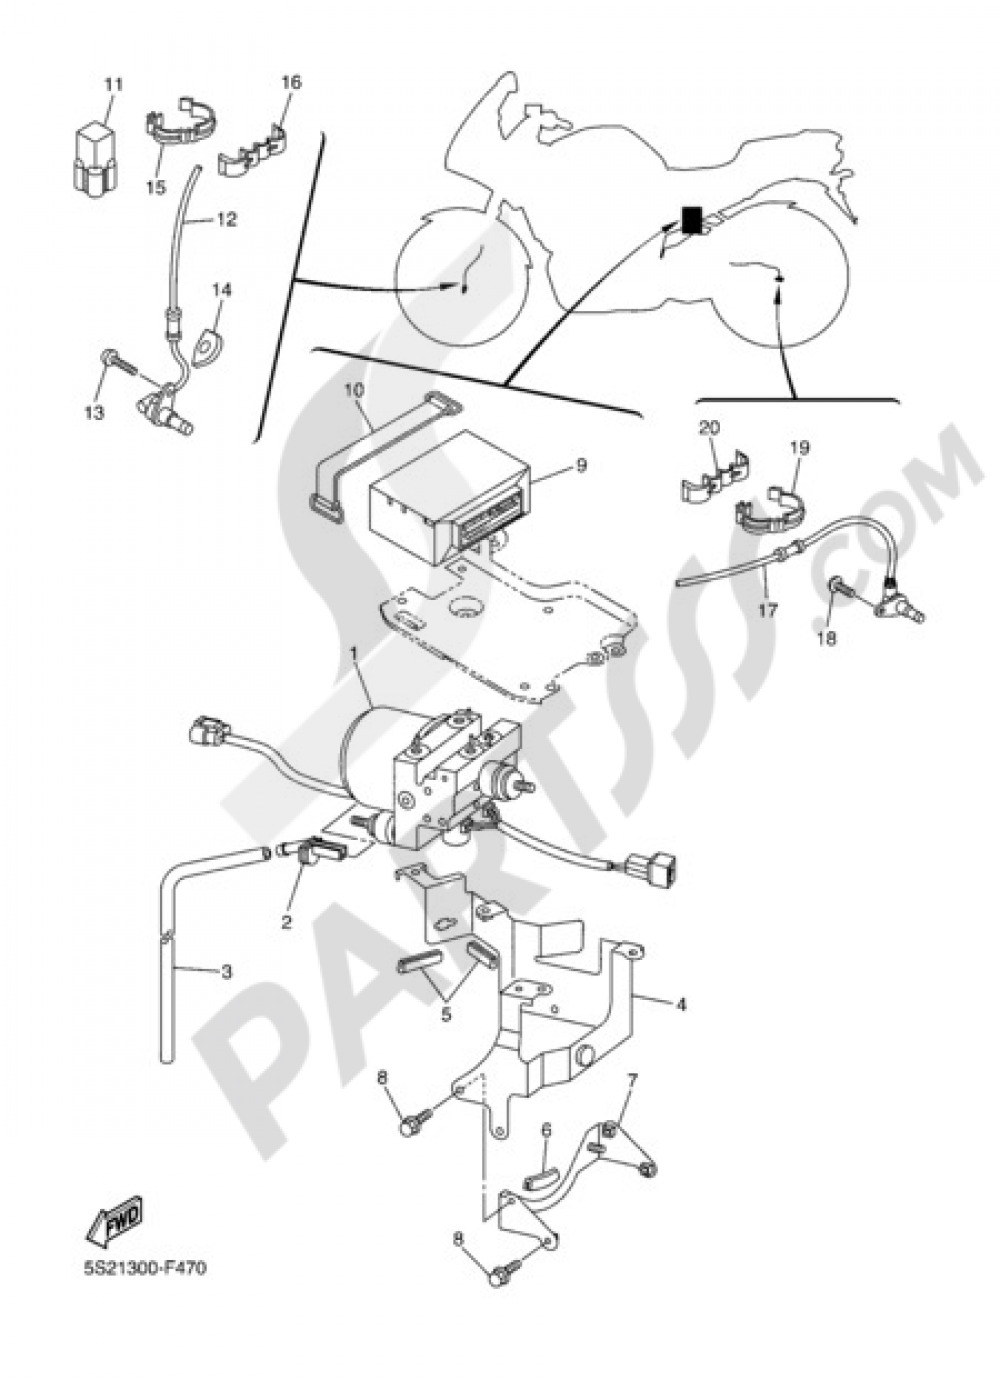 ELECTRIC EQUIPMENT 3 Yamaha FZ6 Fazer S2 ABS 2008